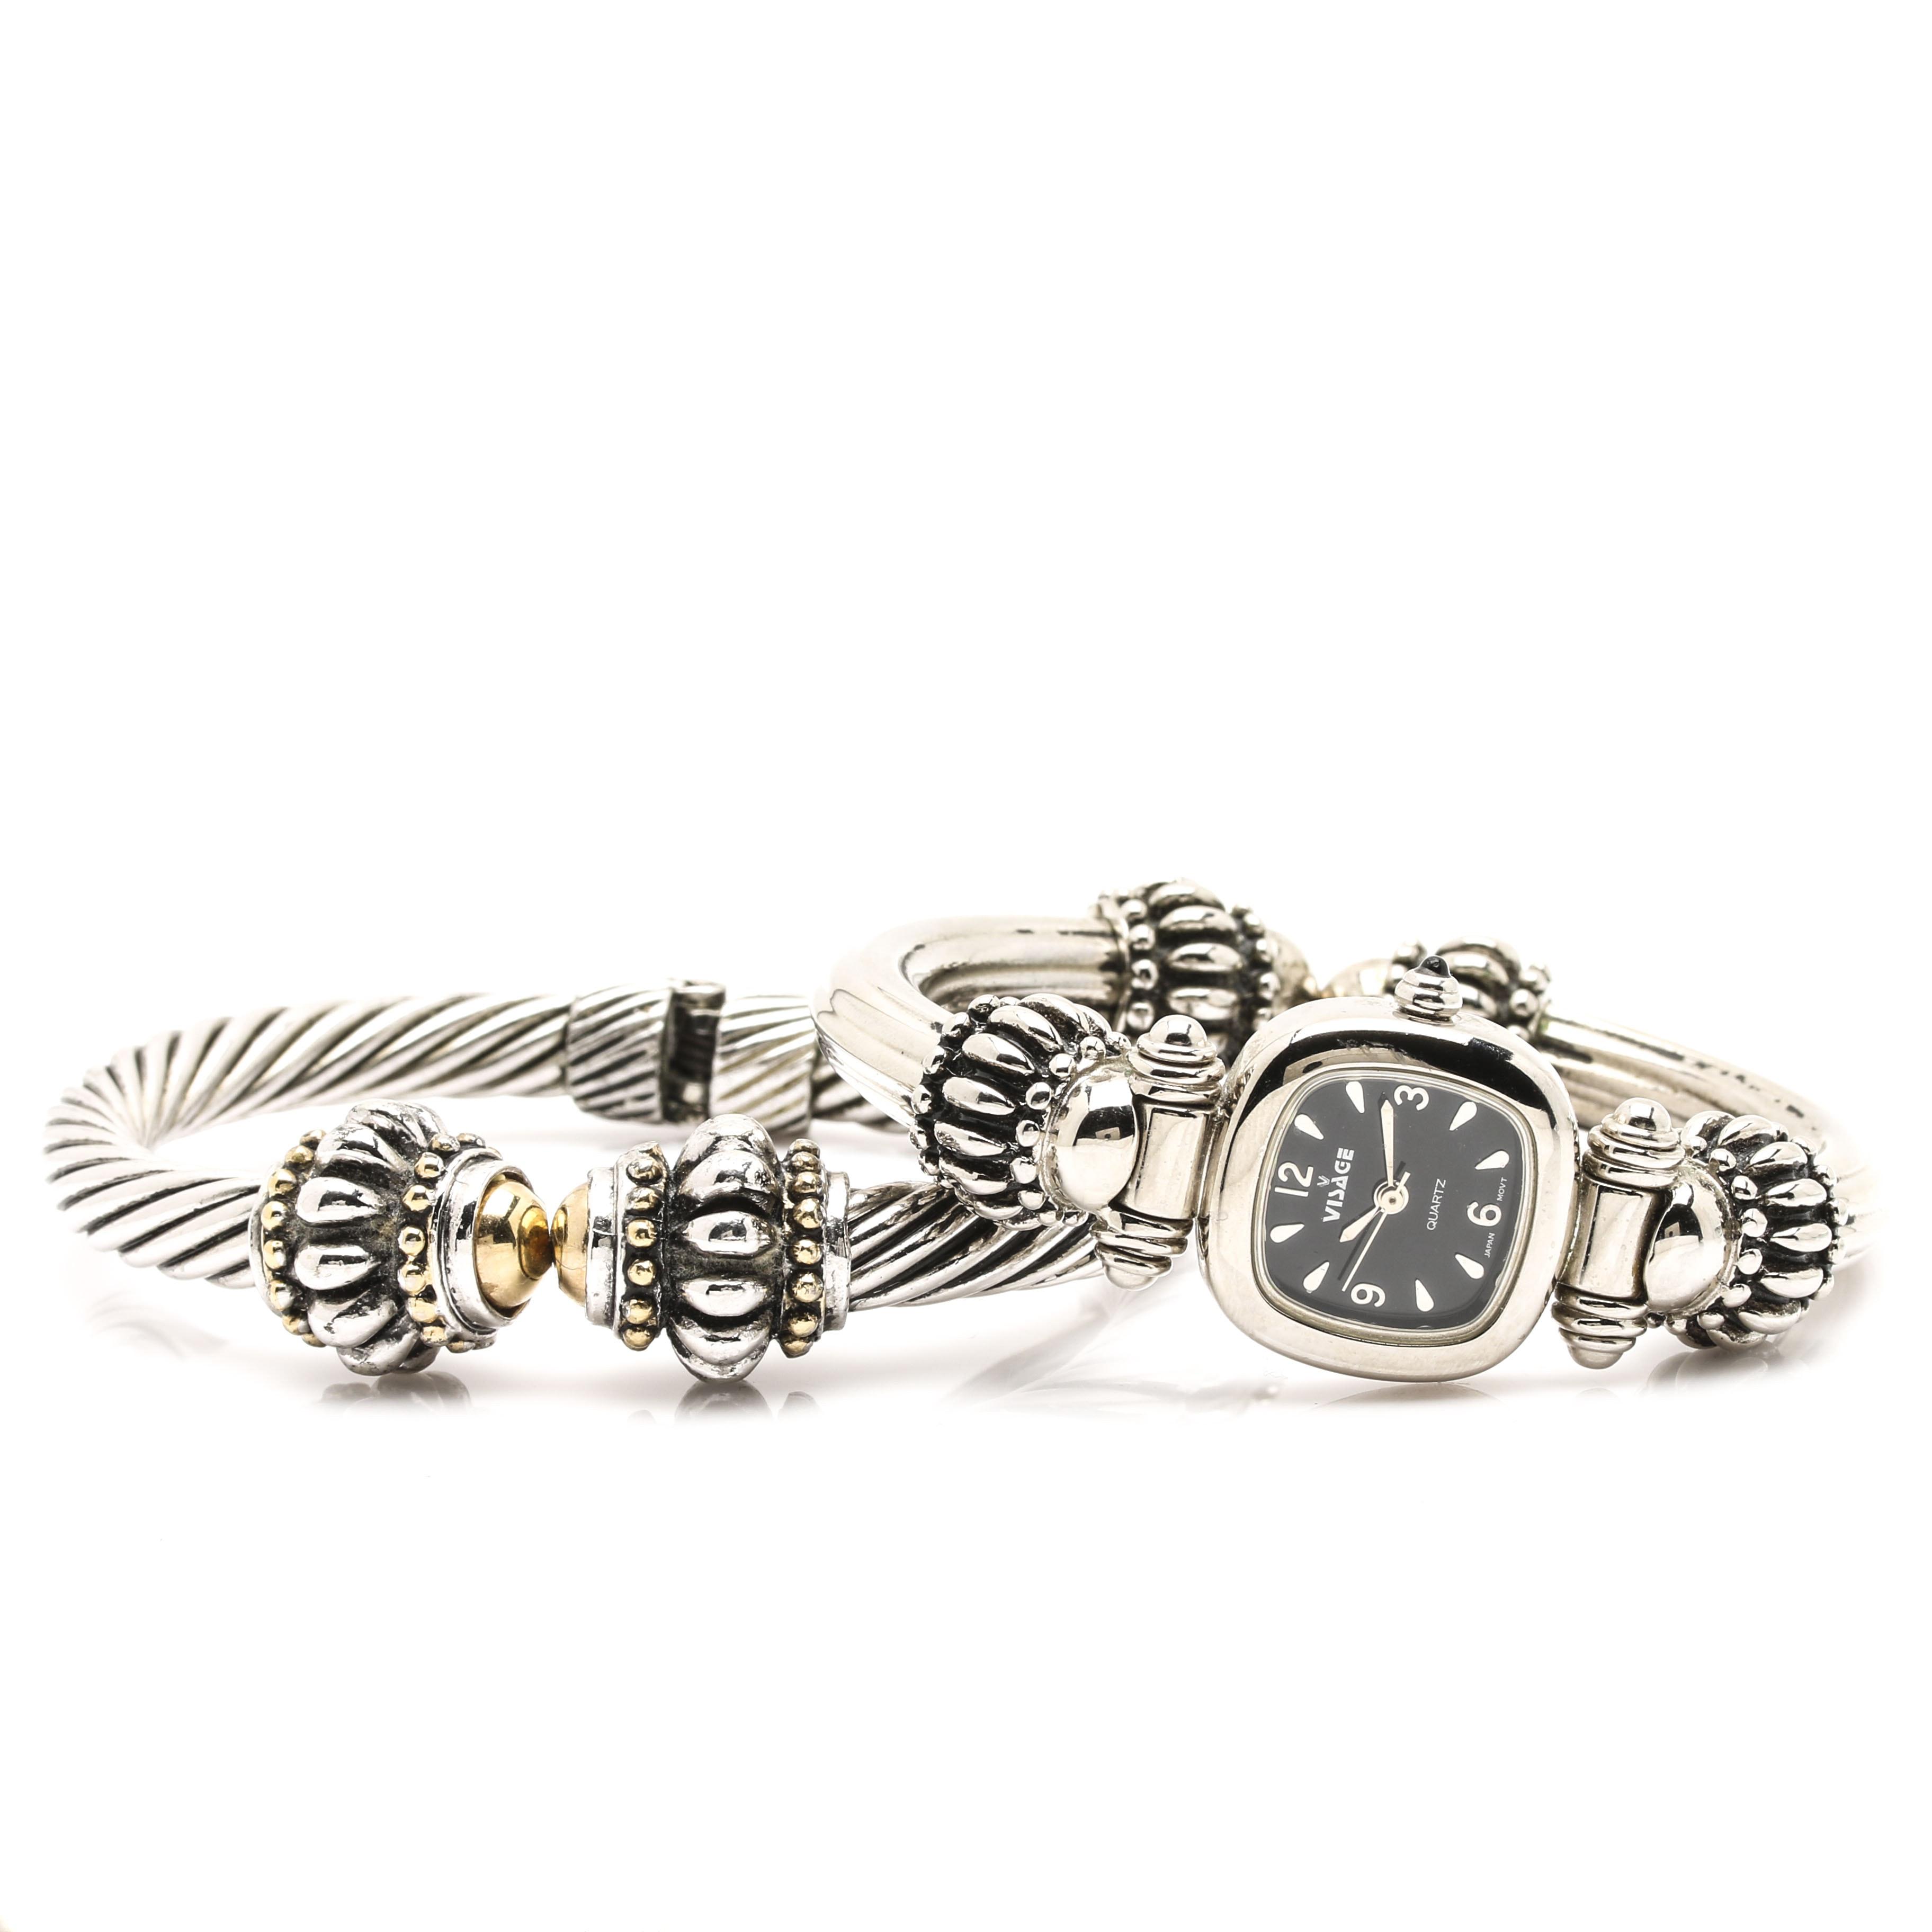 Visage Fashion Wristwatch with Stacking Bangle Bracelet